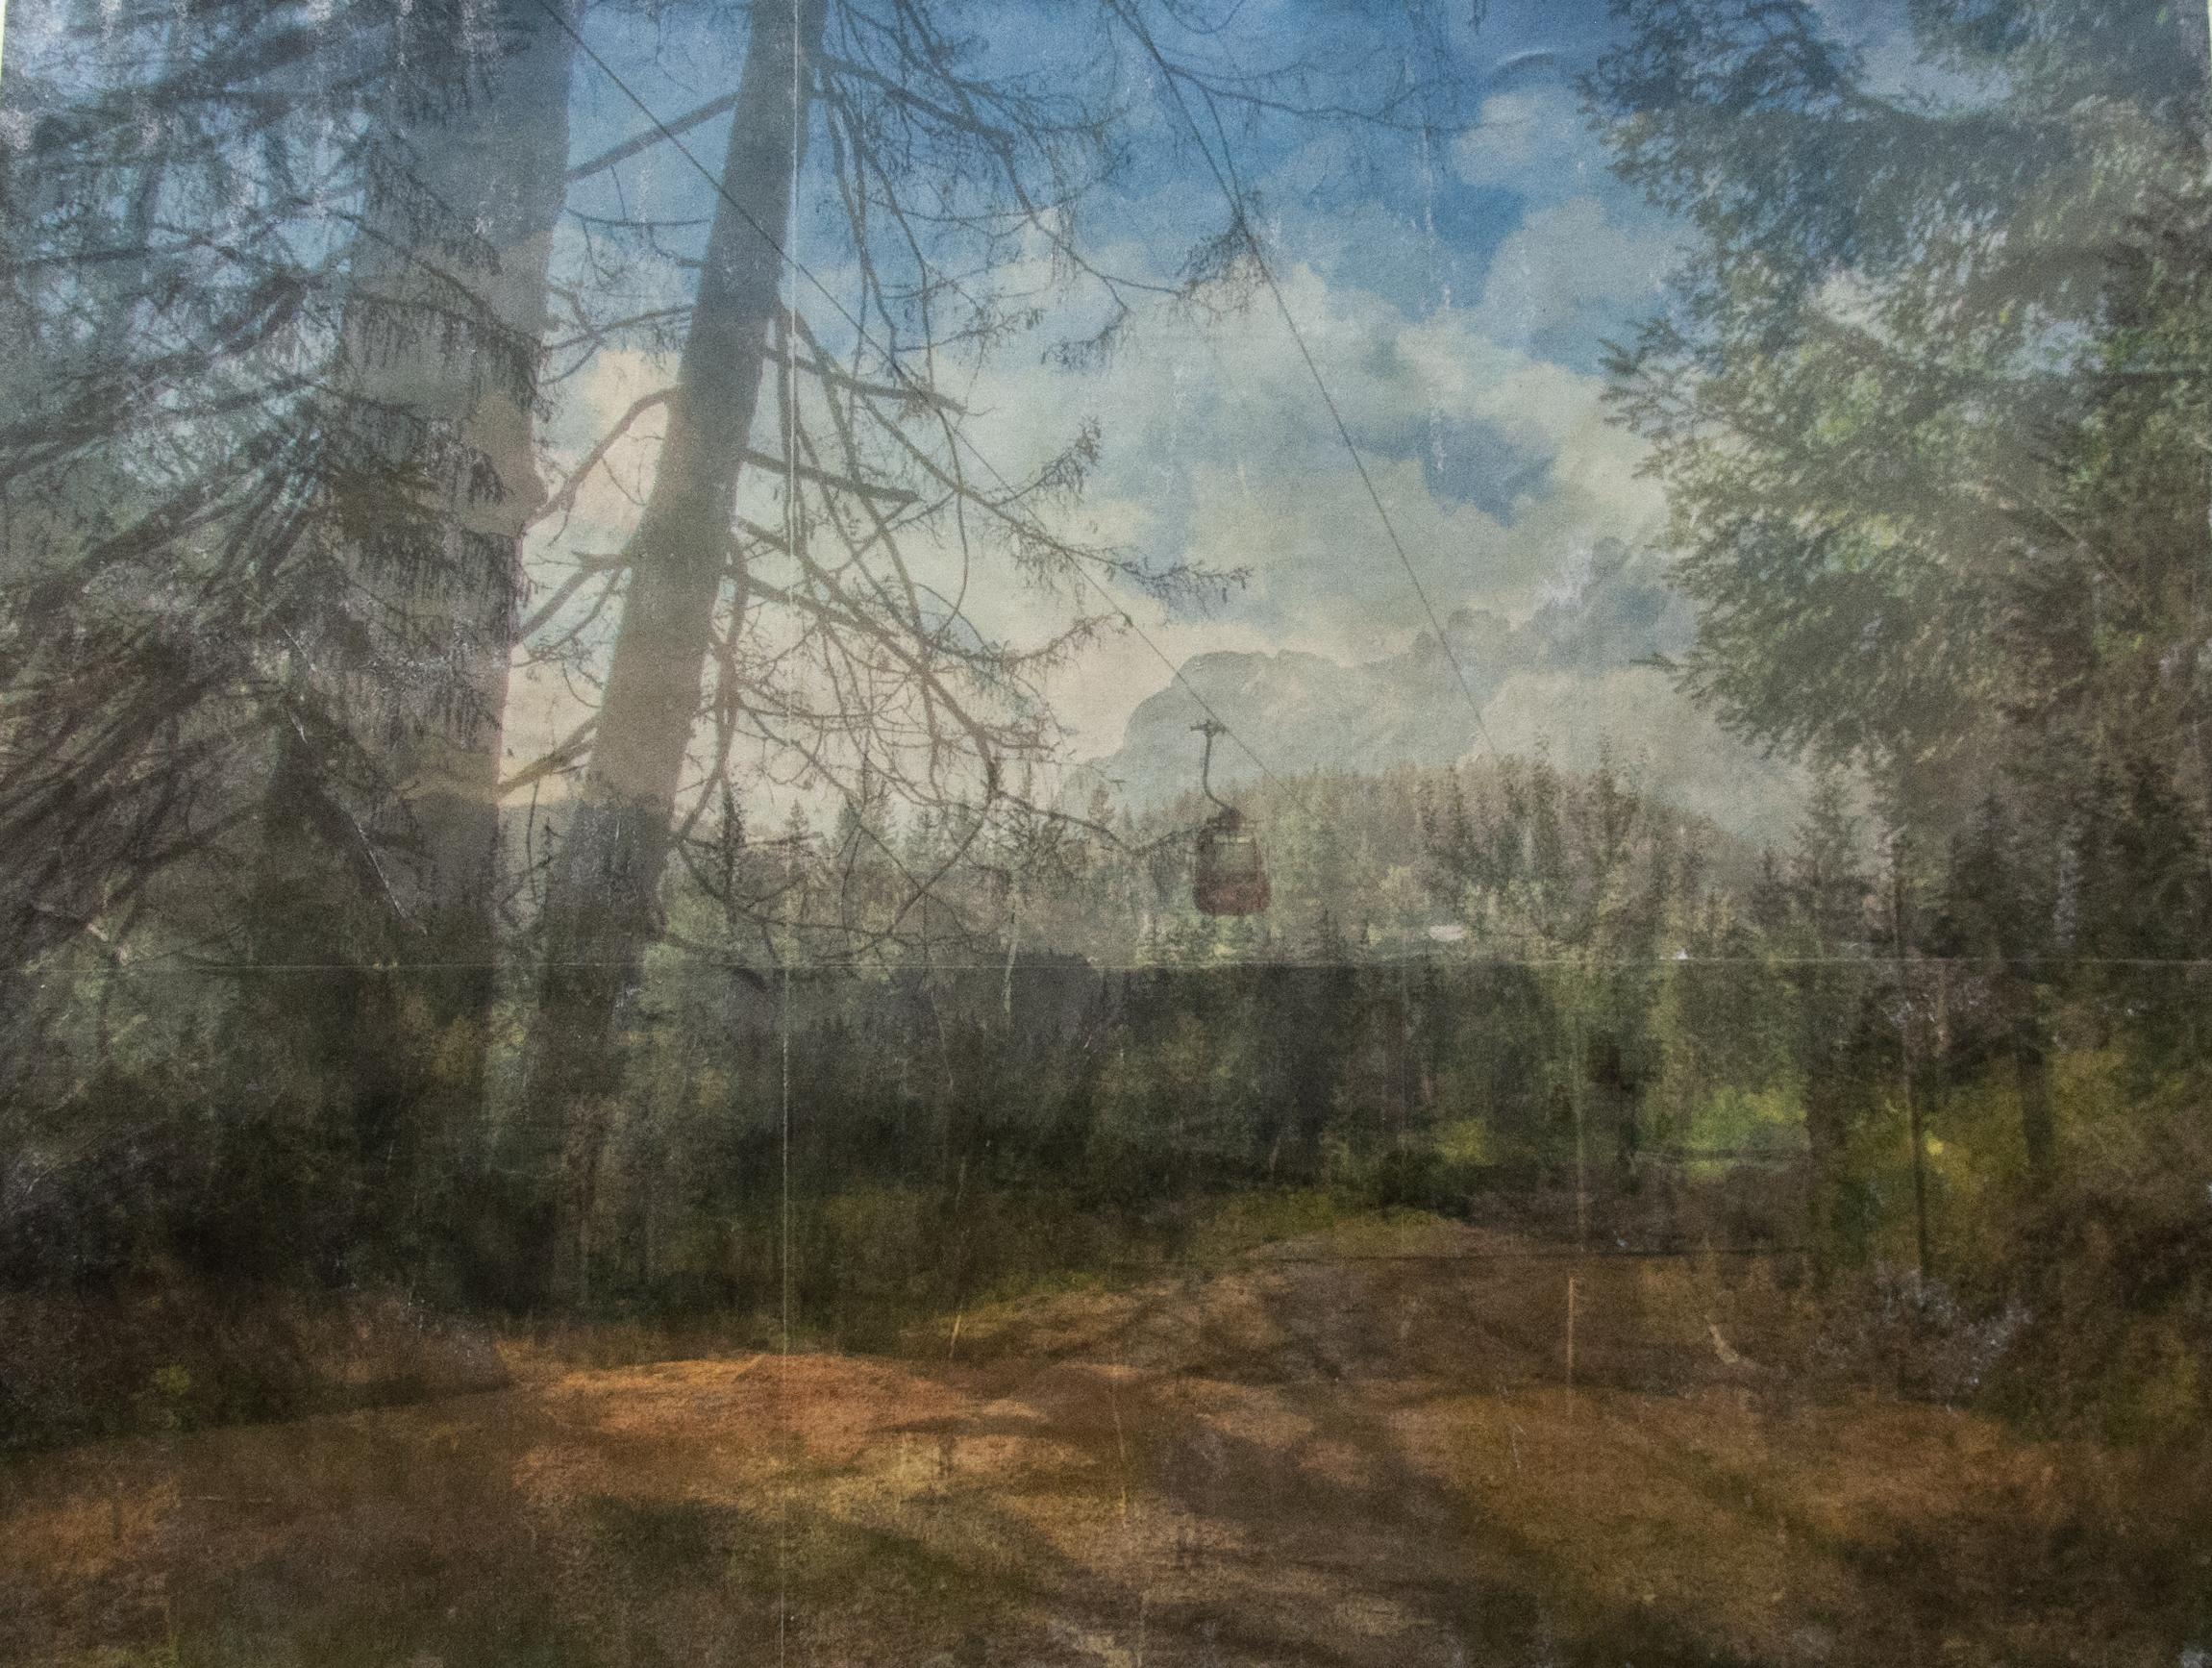 Helen Eggenschwiler: Gedruckte Traumrealität